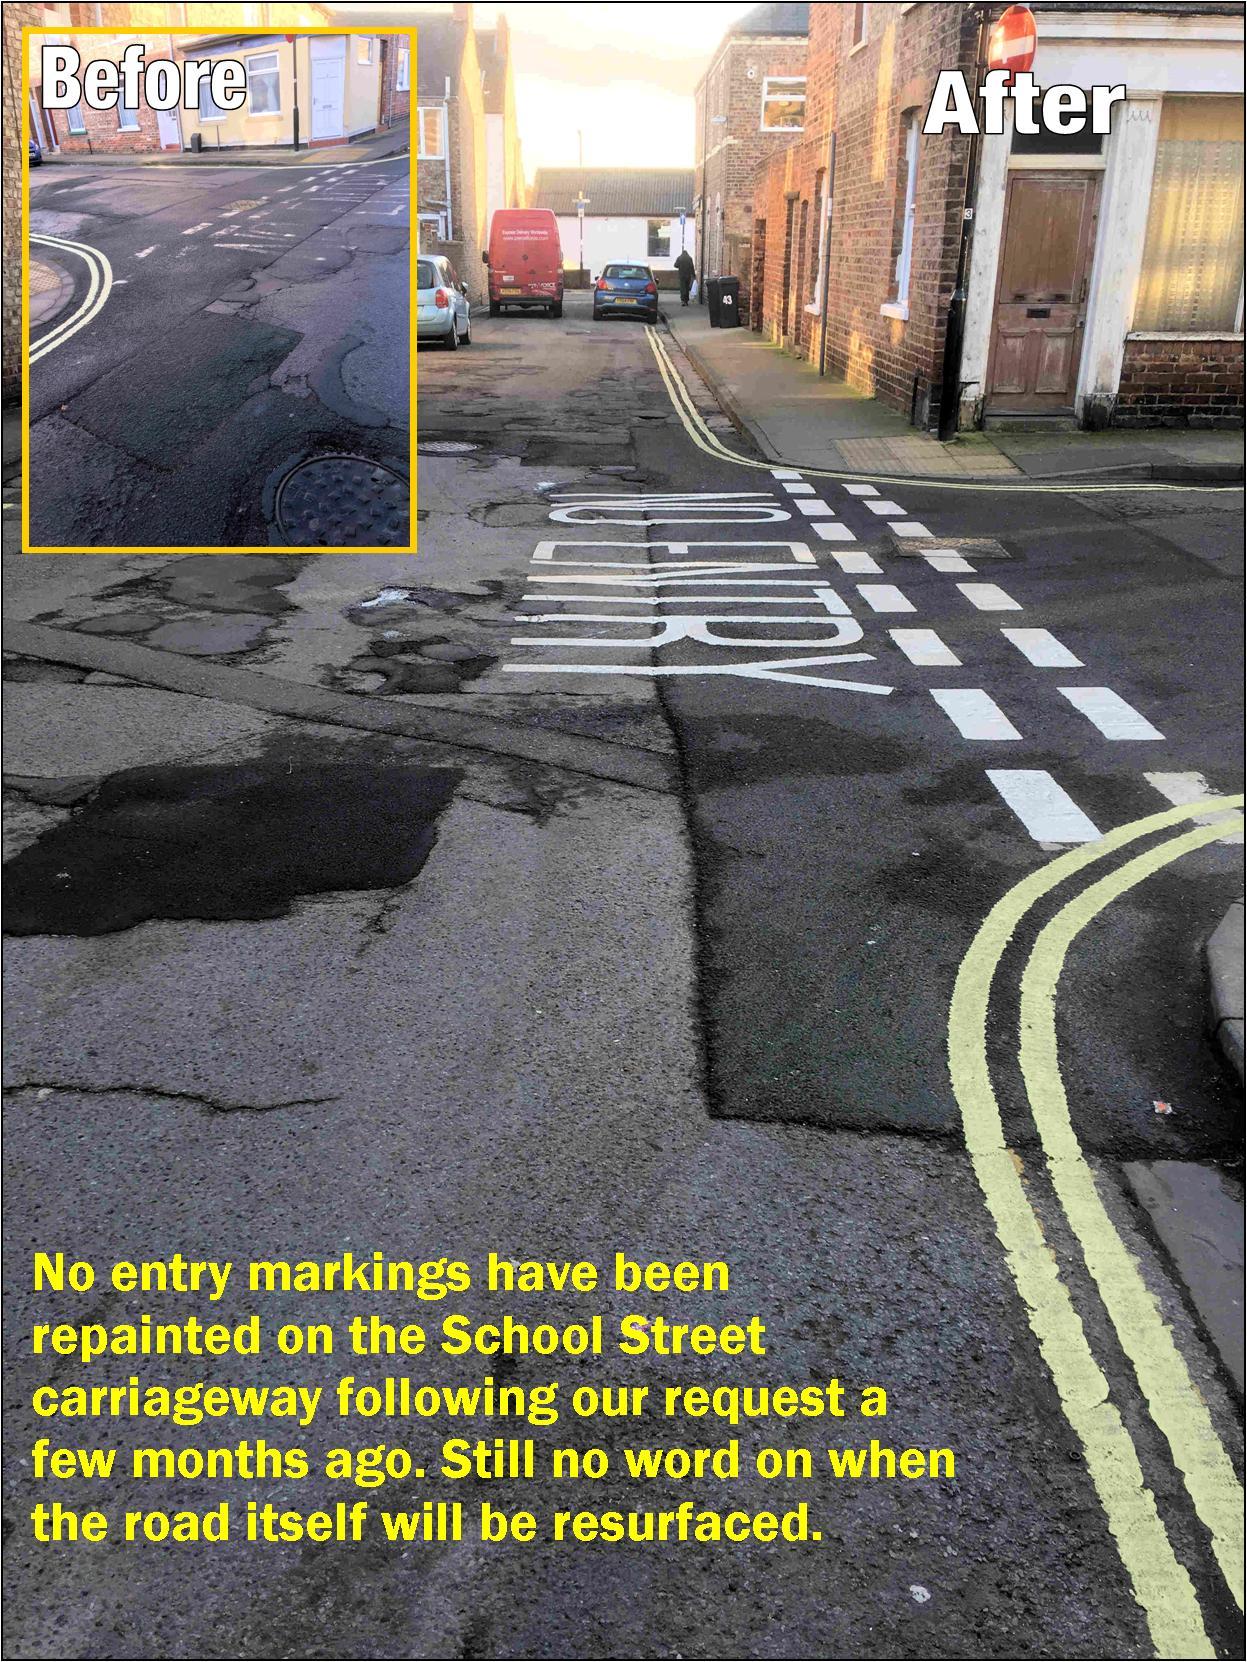 schools-st-no-entry-markings